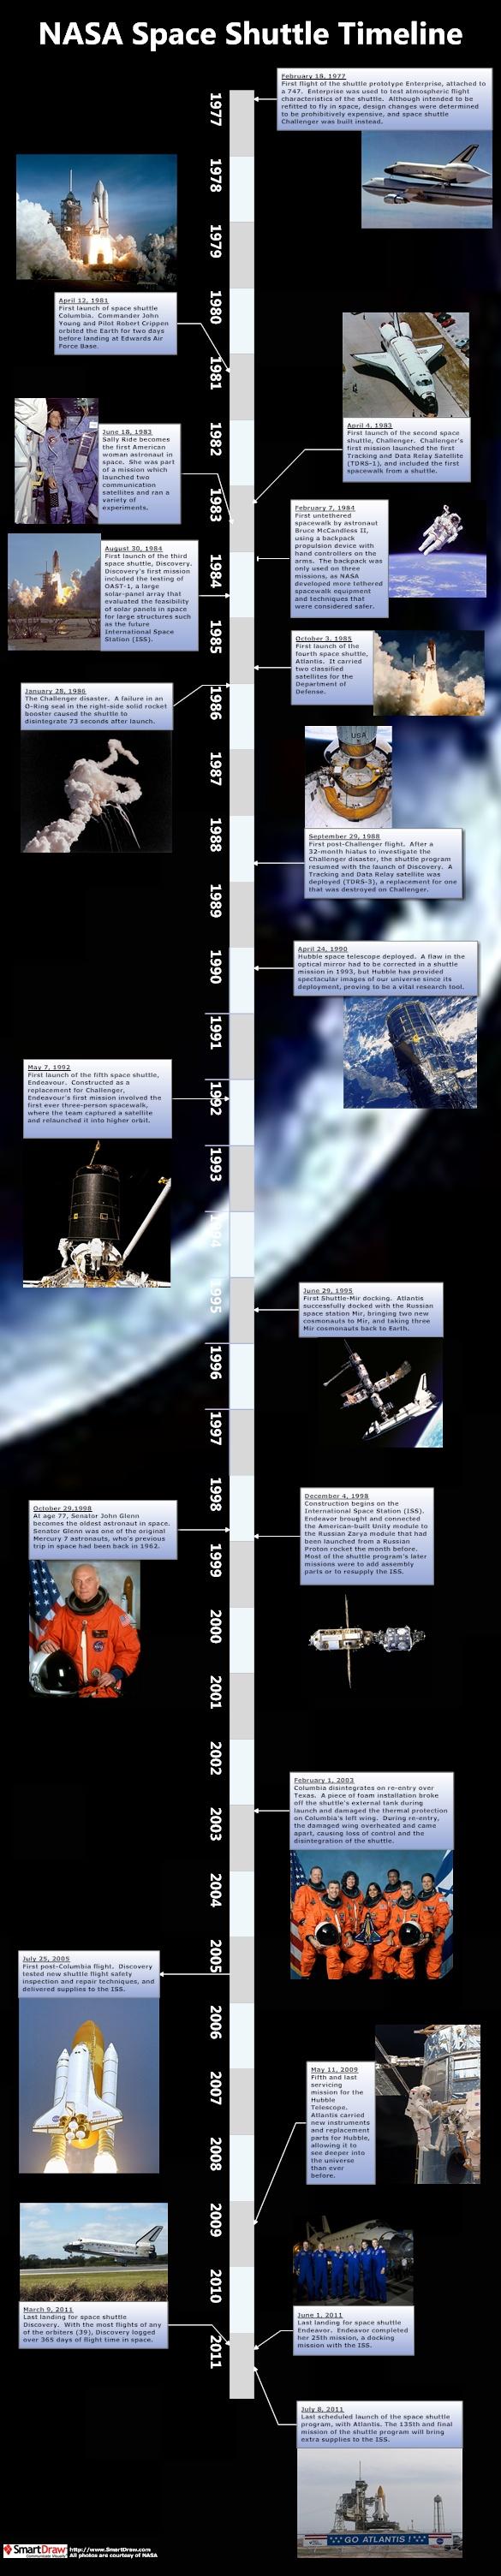 space shuttle program timeline - photo #23